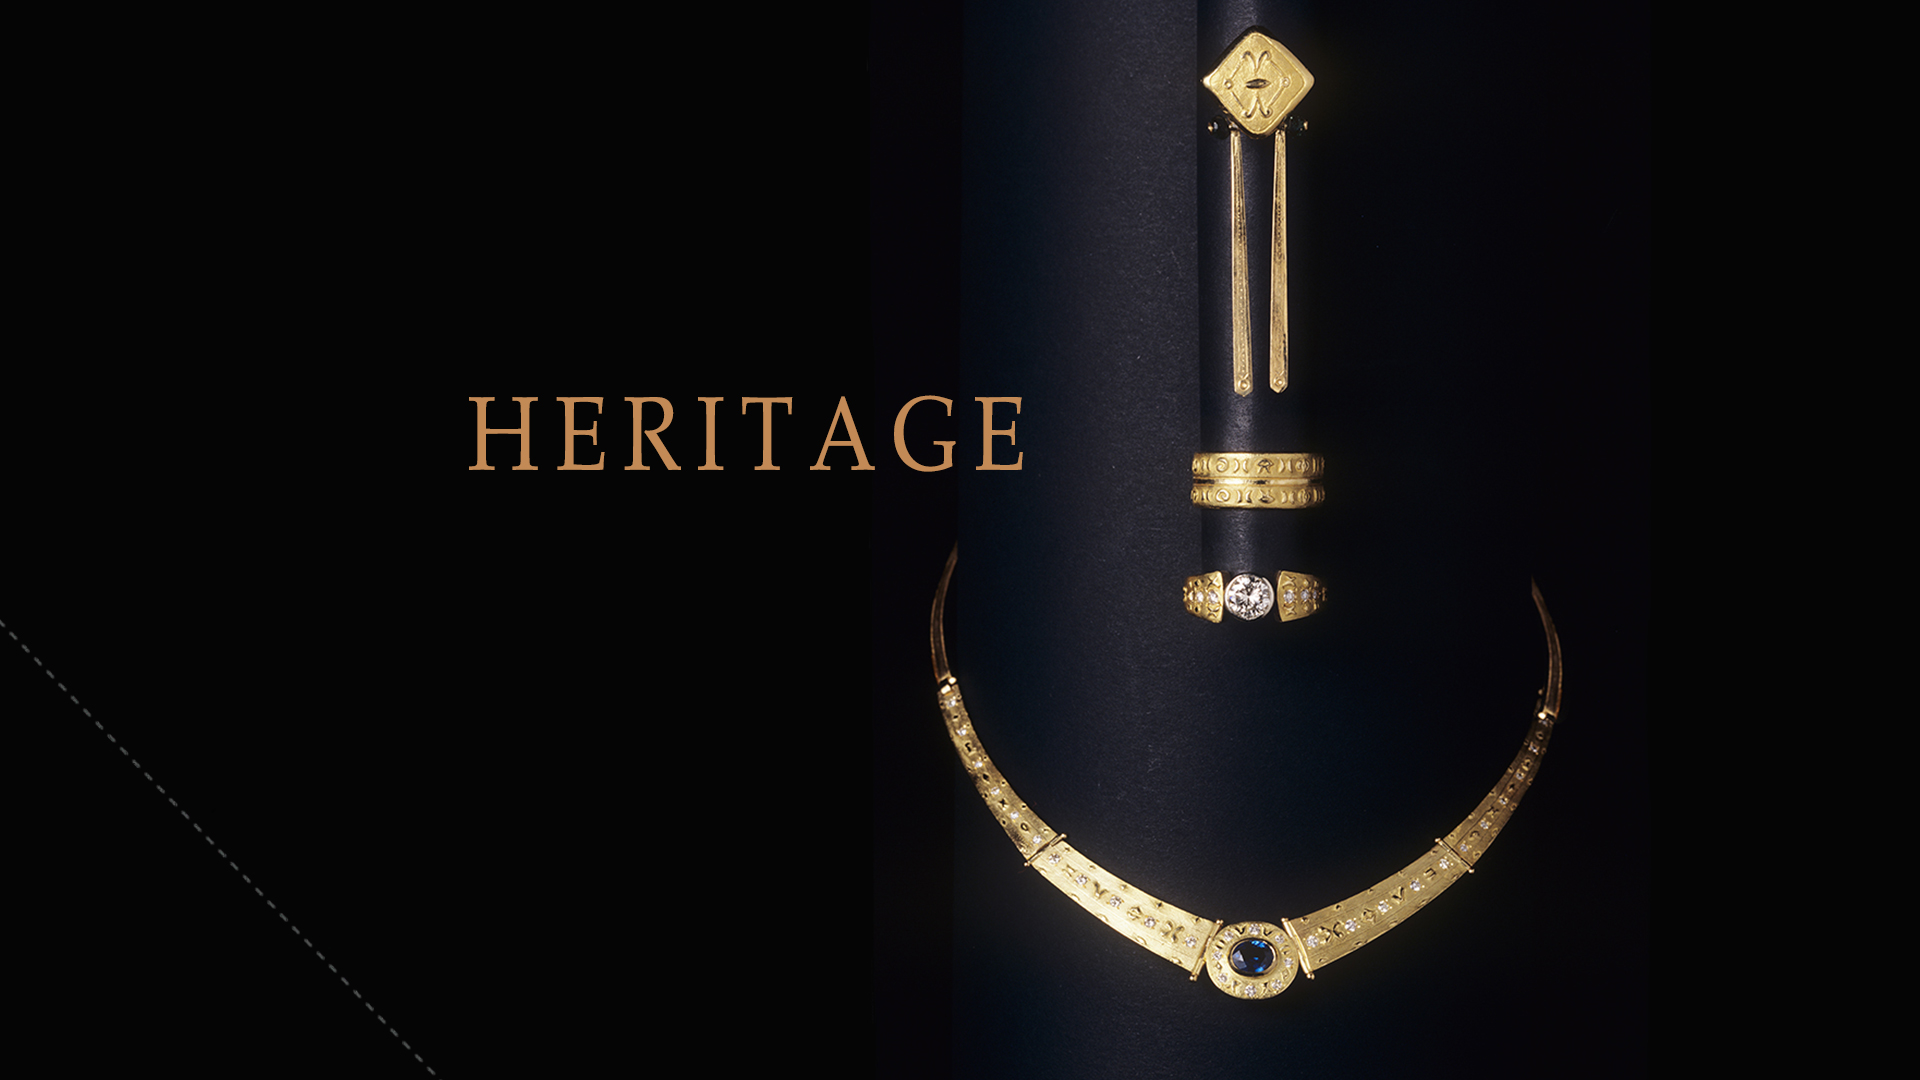 heritage Daverio 1933, Shop Heritage